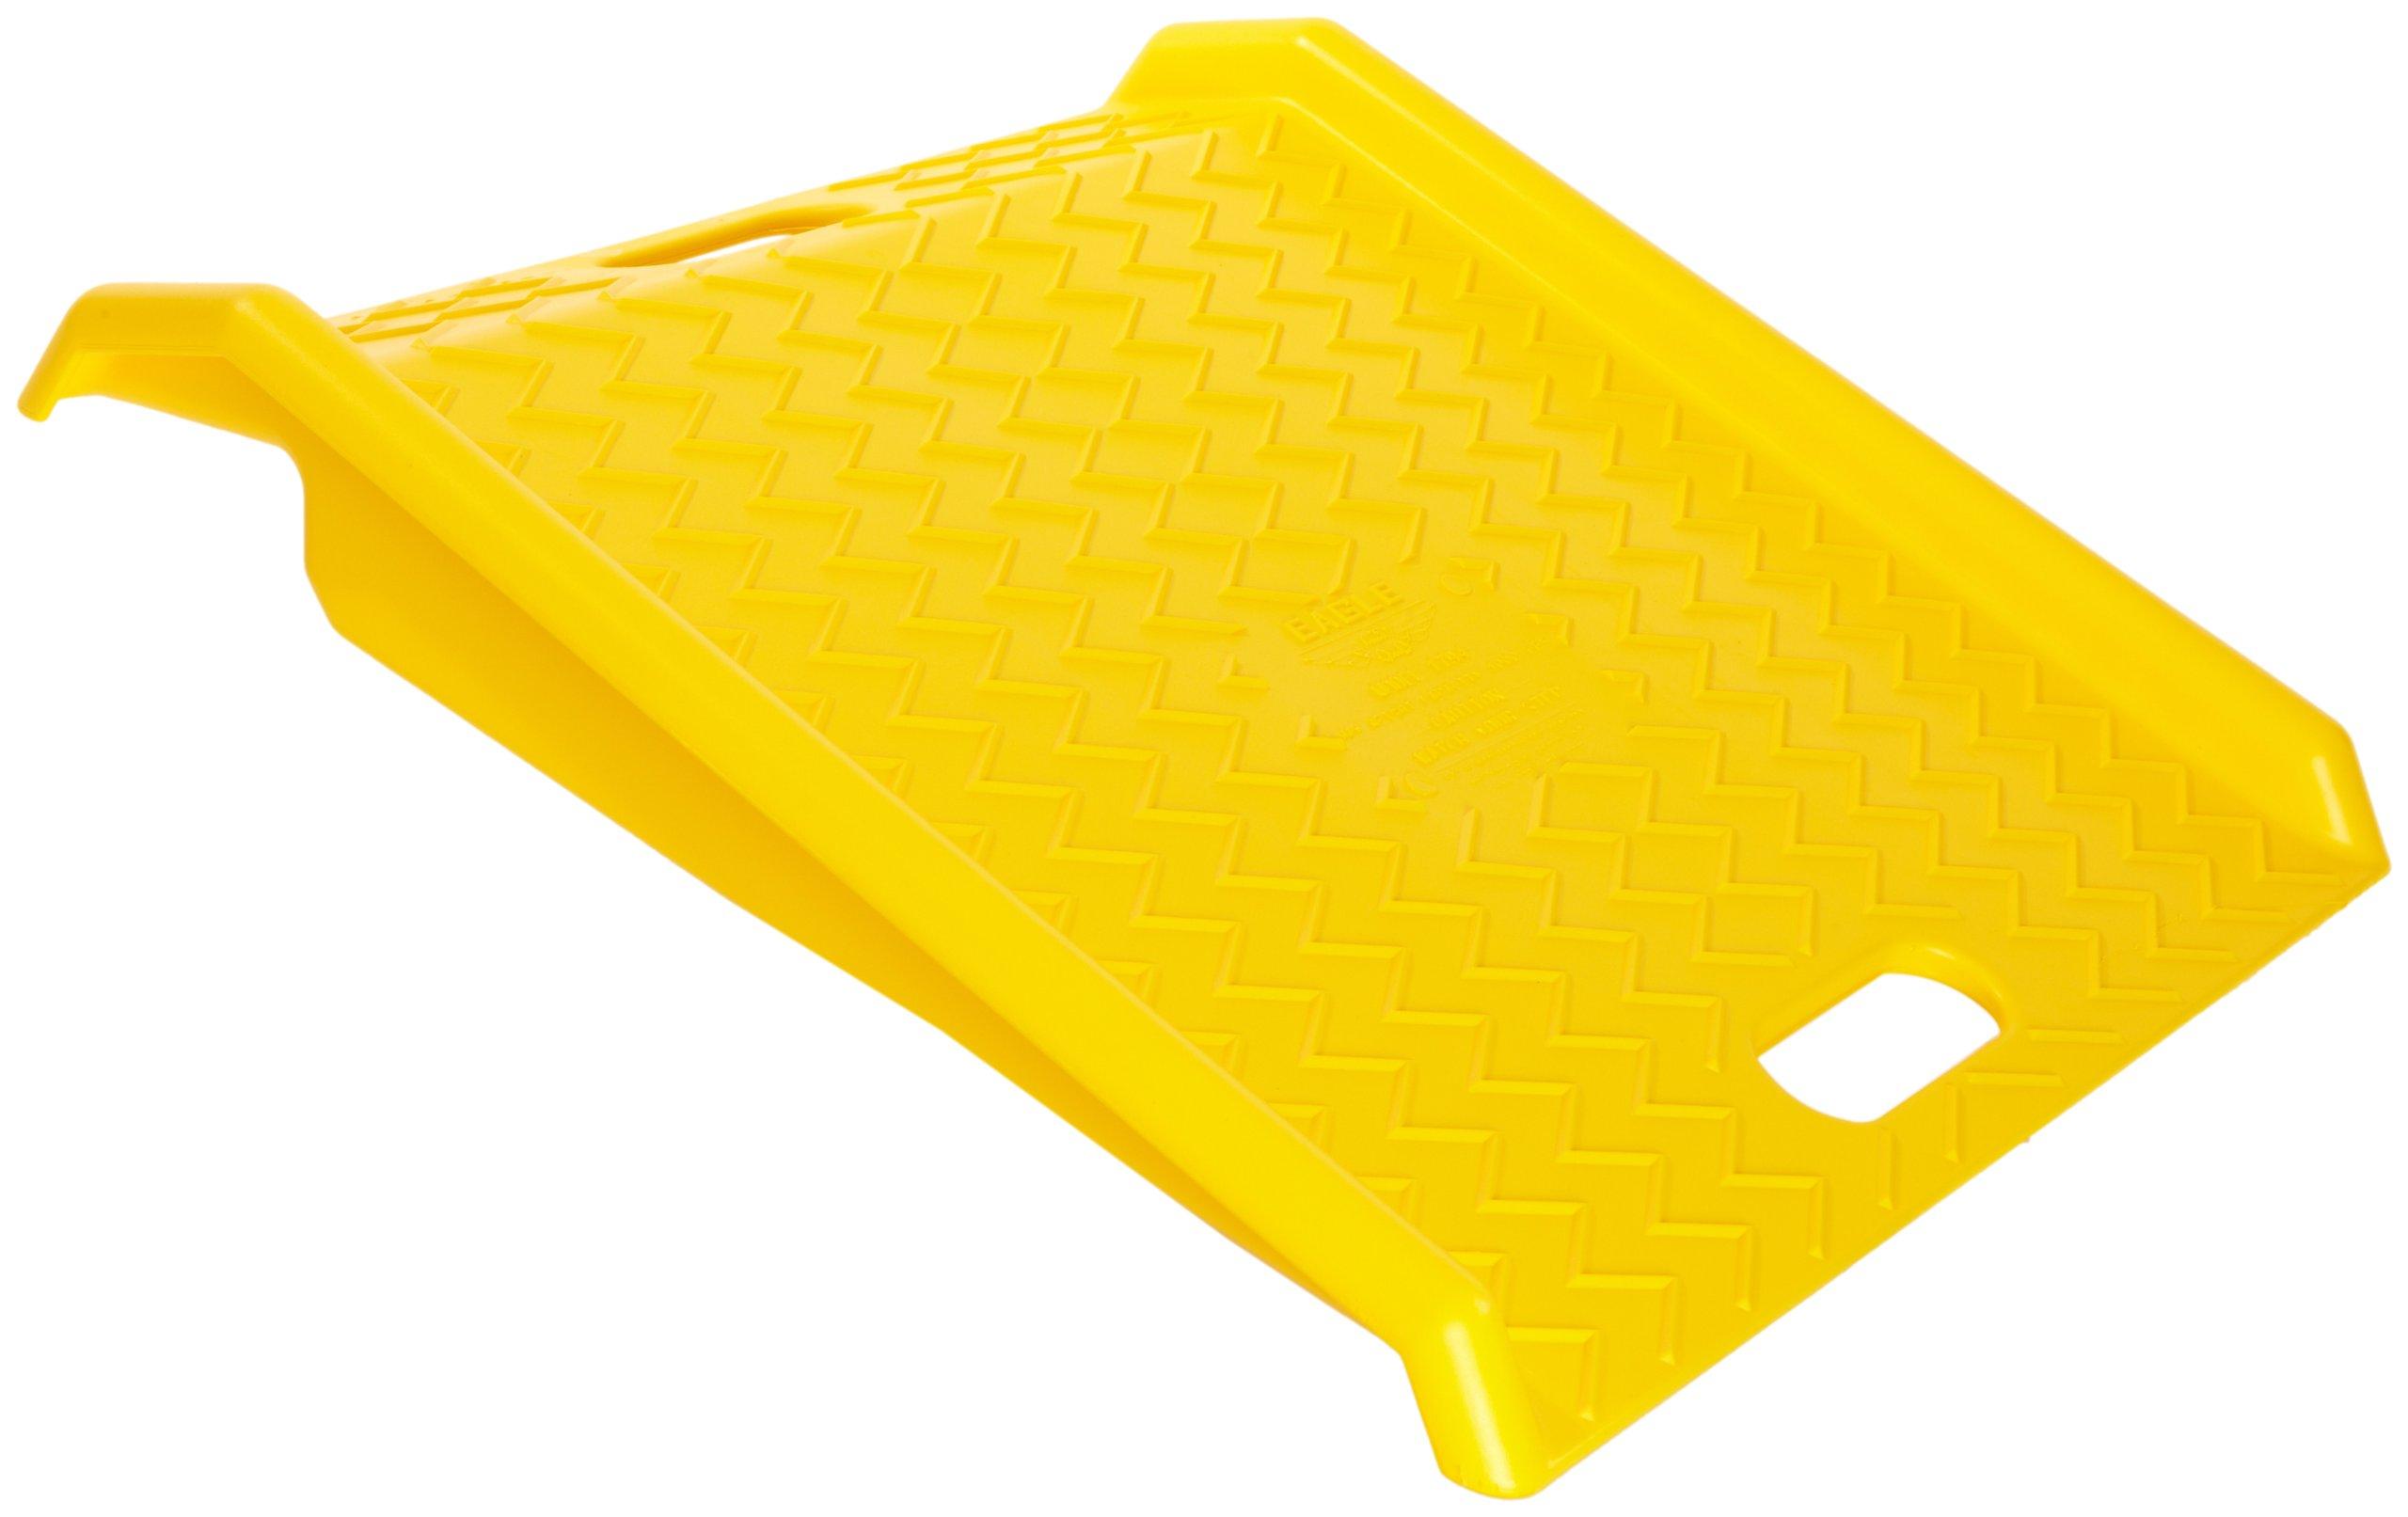 Eagle 1794 High Density Polyethylene Curb Ramp, Yellow, 1000 lbs Load Capacity, 27'' Length, 27'' Width, 4'' Height